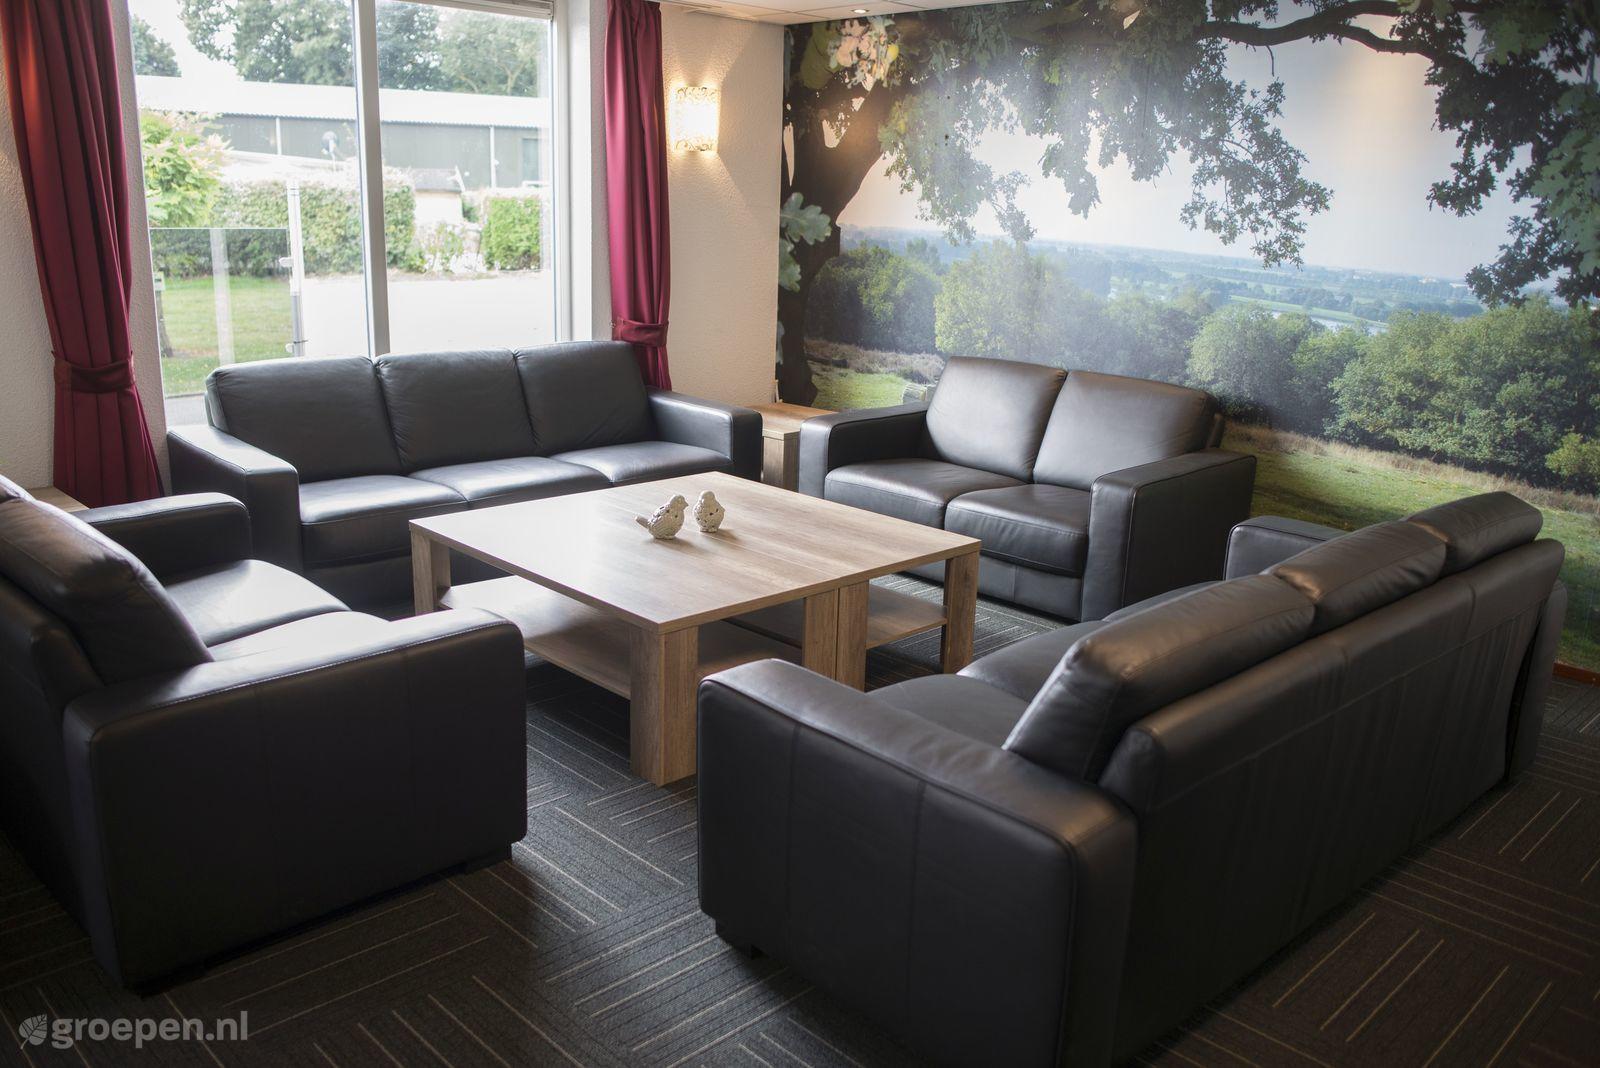 Group accommodation Groesbeek